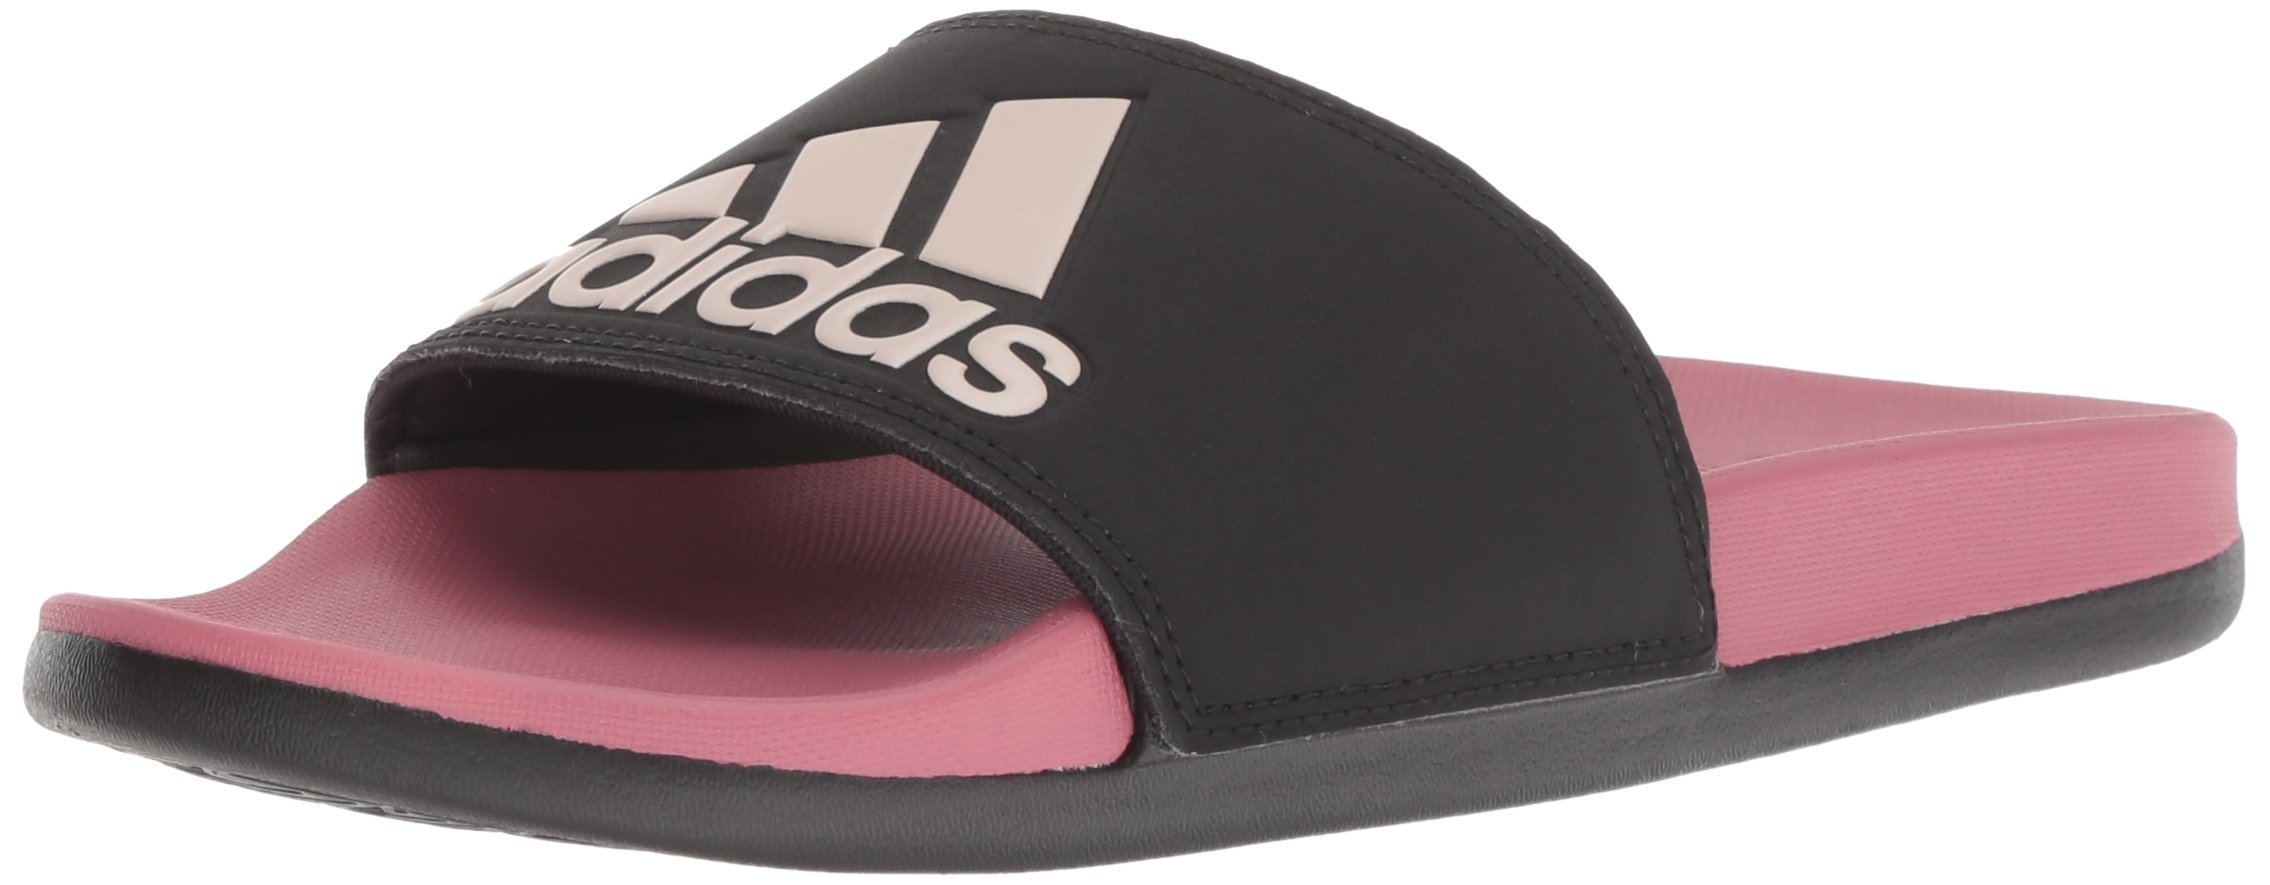 adidas Women's Adilette Comfort Slide Sandal, Black/Vapour Grey Metallic/Trace Maroon, 6 M US